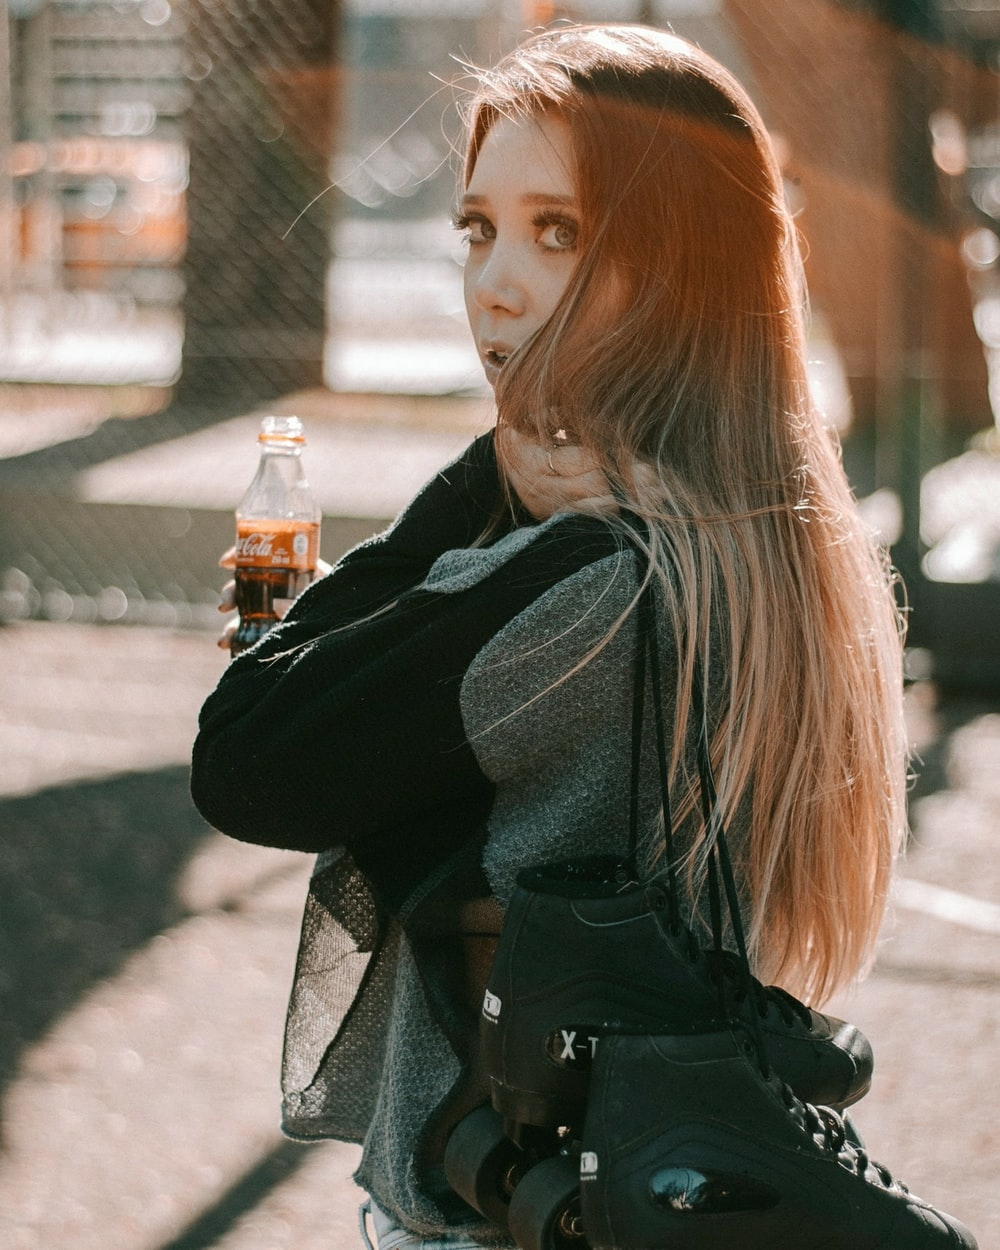 woman wearing black and gray jacket holding bottle of coke